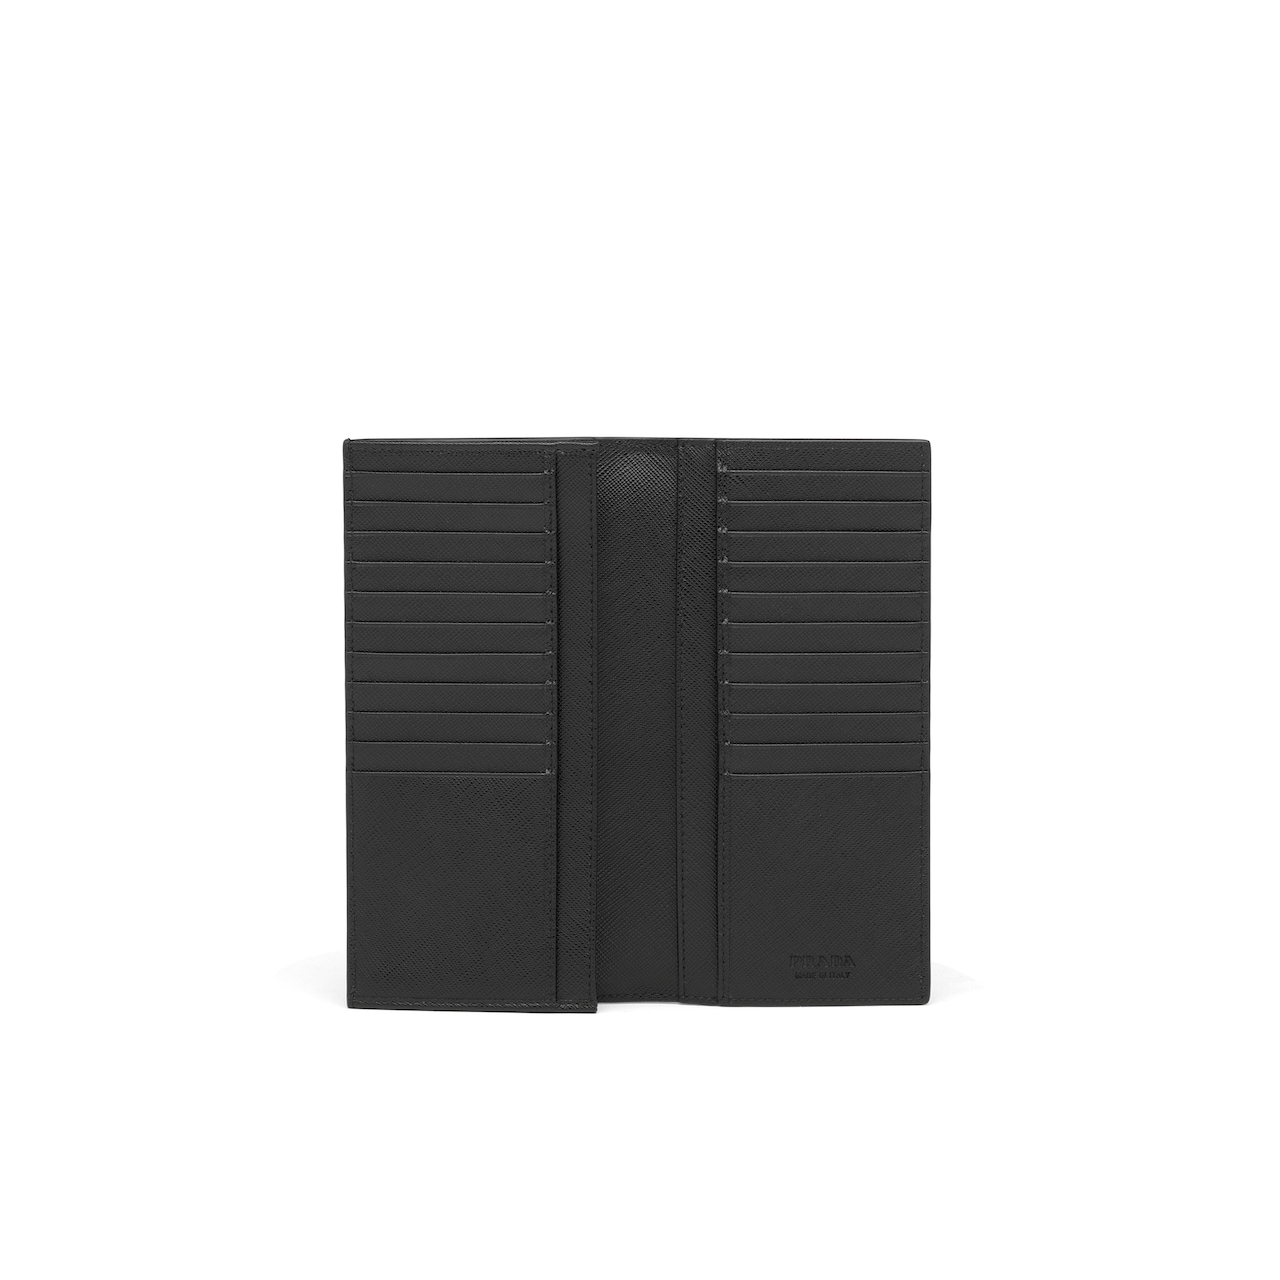 Prada Saffiano leather document holder 2